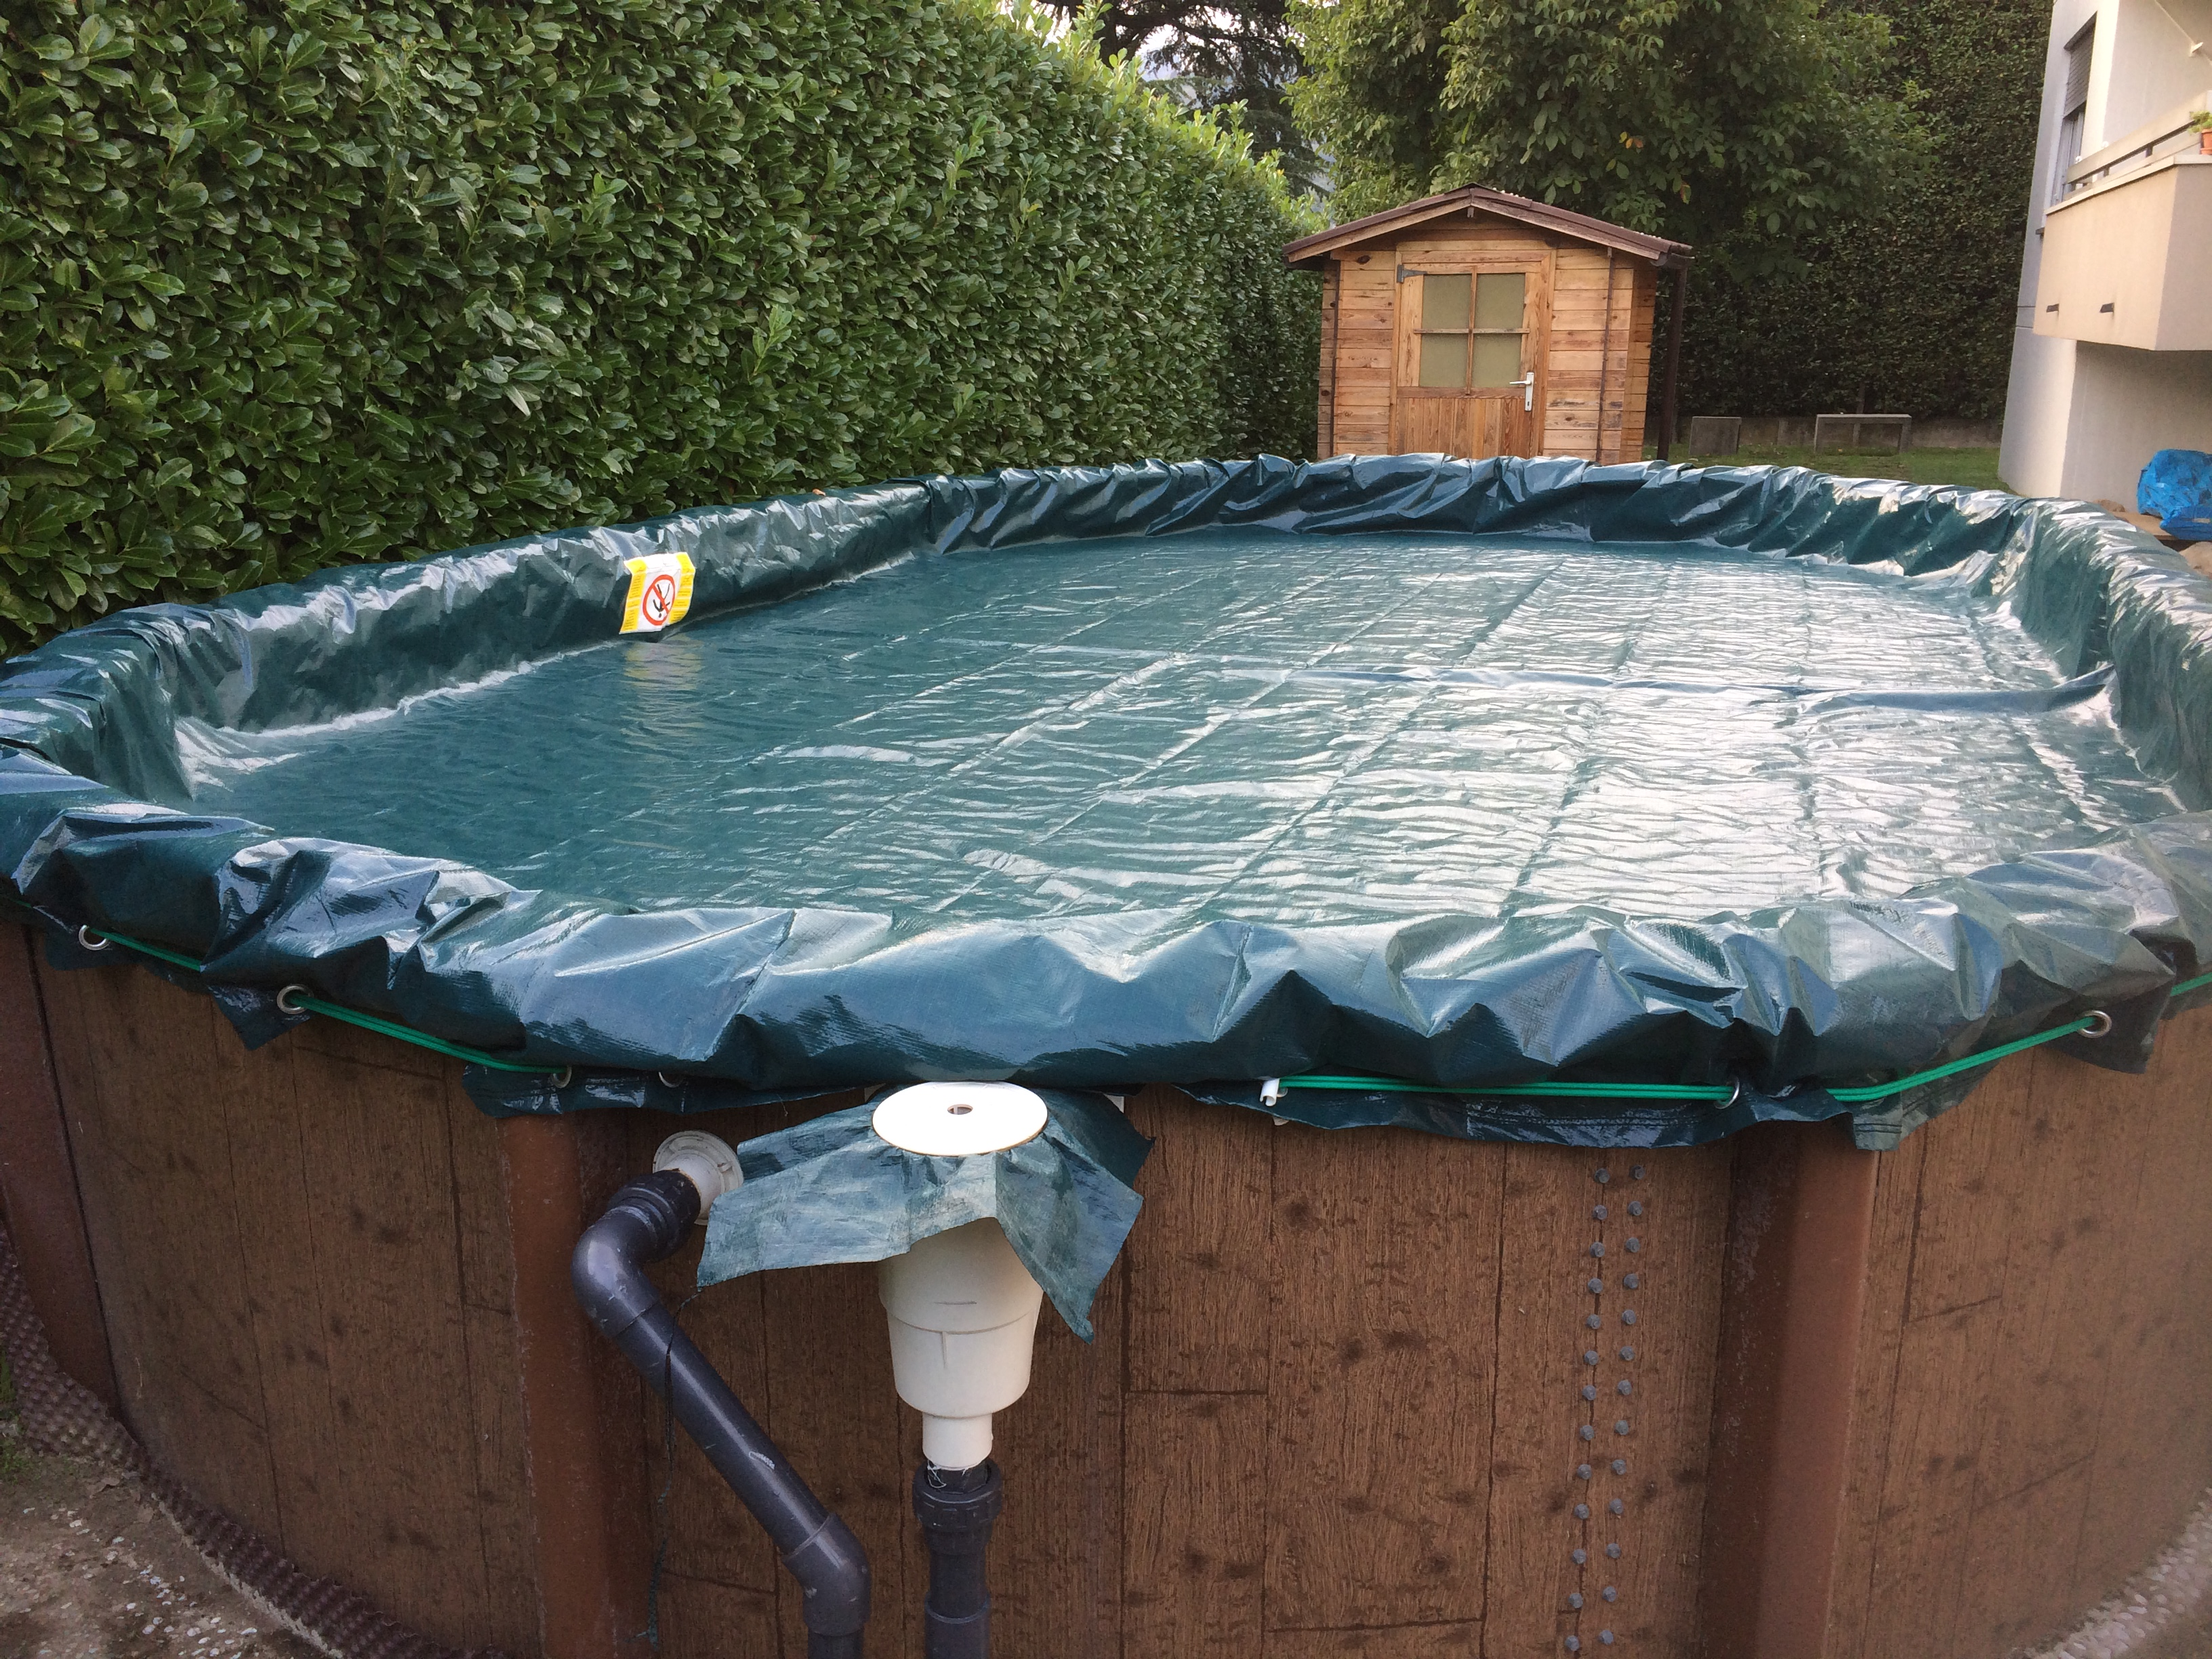 Copertura invernale kit chiusura piscina fuoriterra gre ovale 730x375 castelflora - Chiusura invernale piscina ...